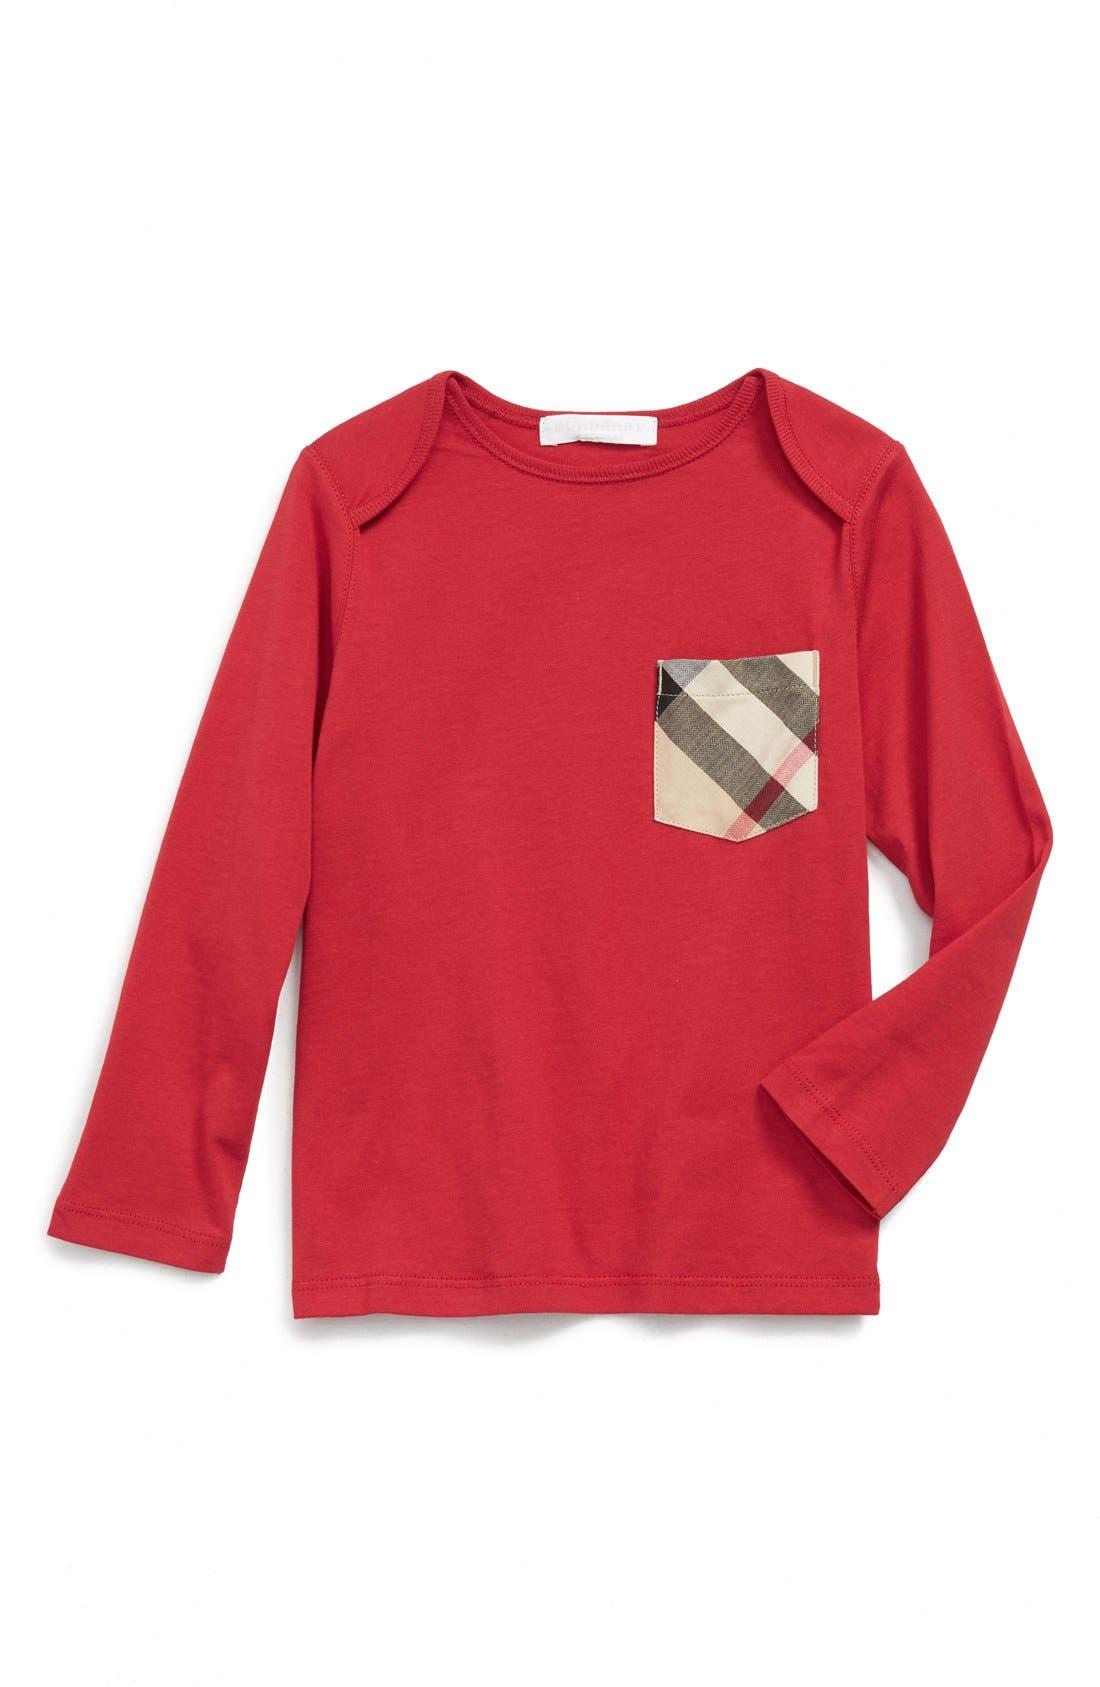 Main Image - Burberry 'Callum' Check Print Chest Pocket T-Shirt (Toddler Boys)